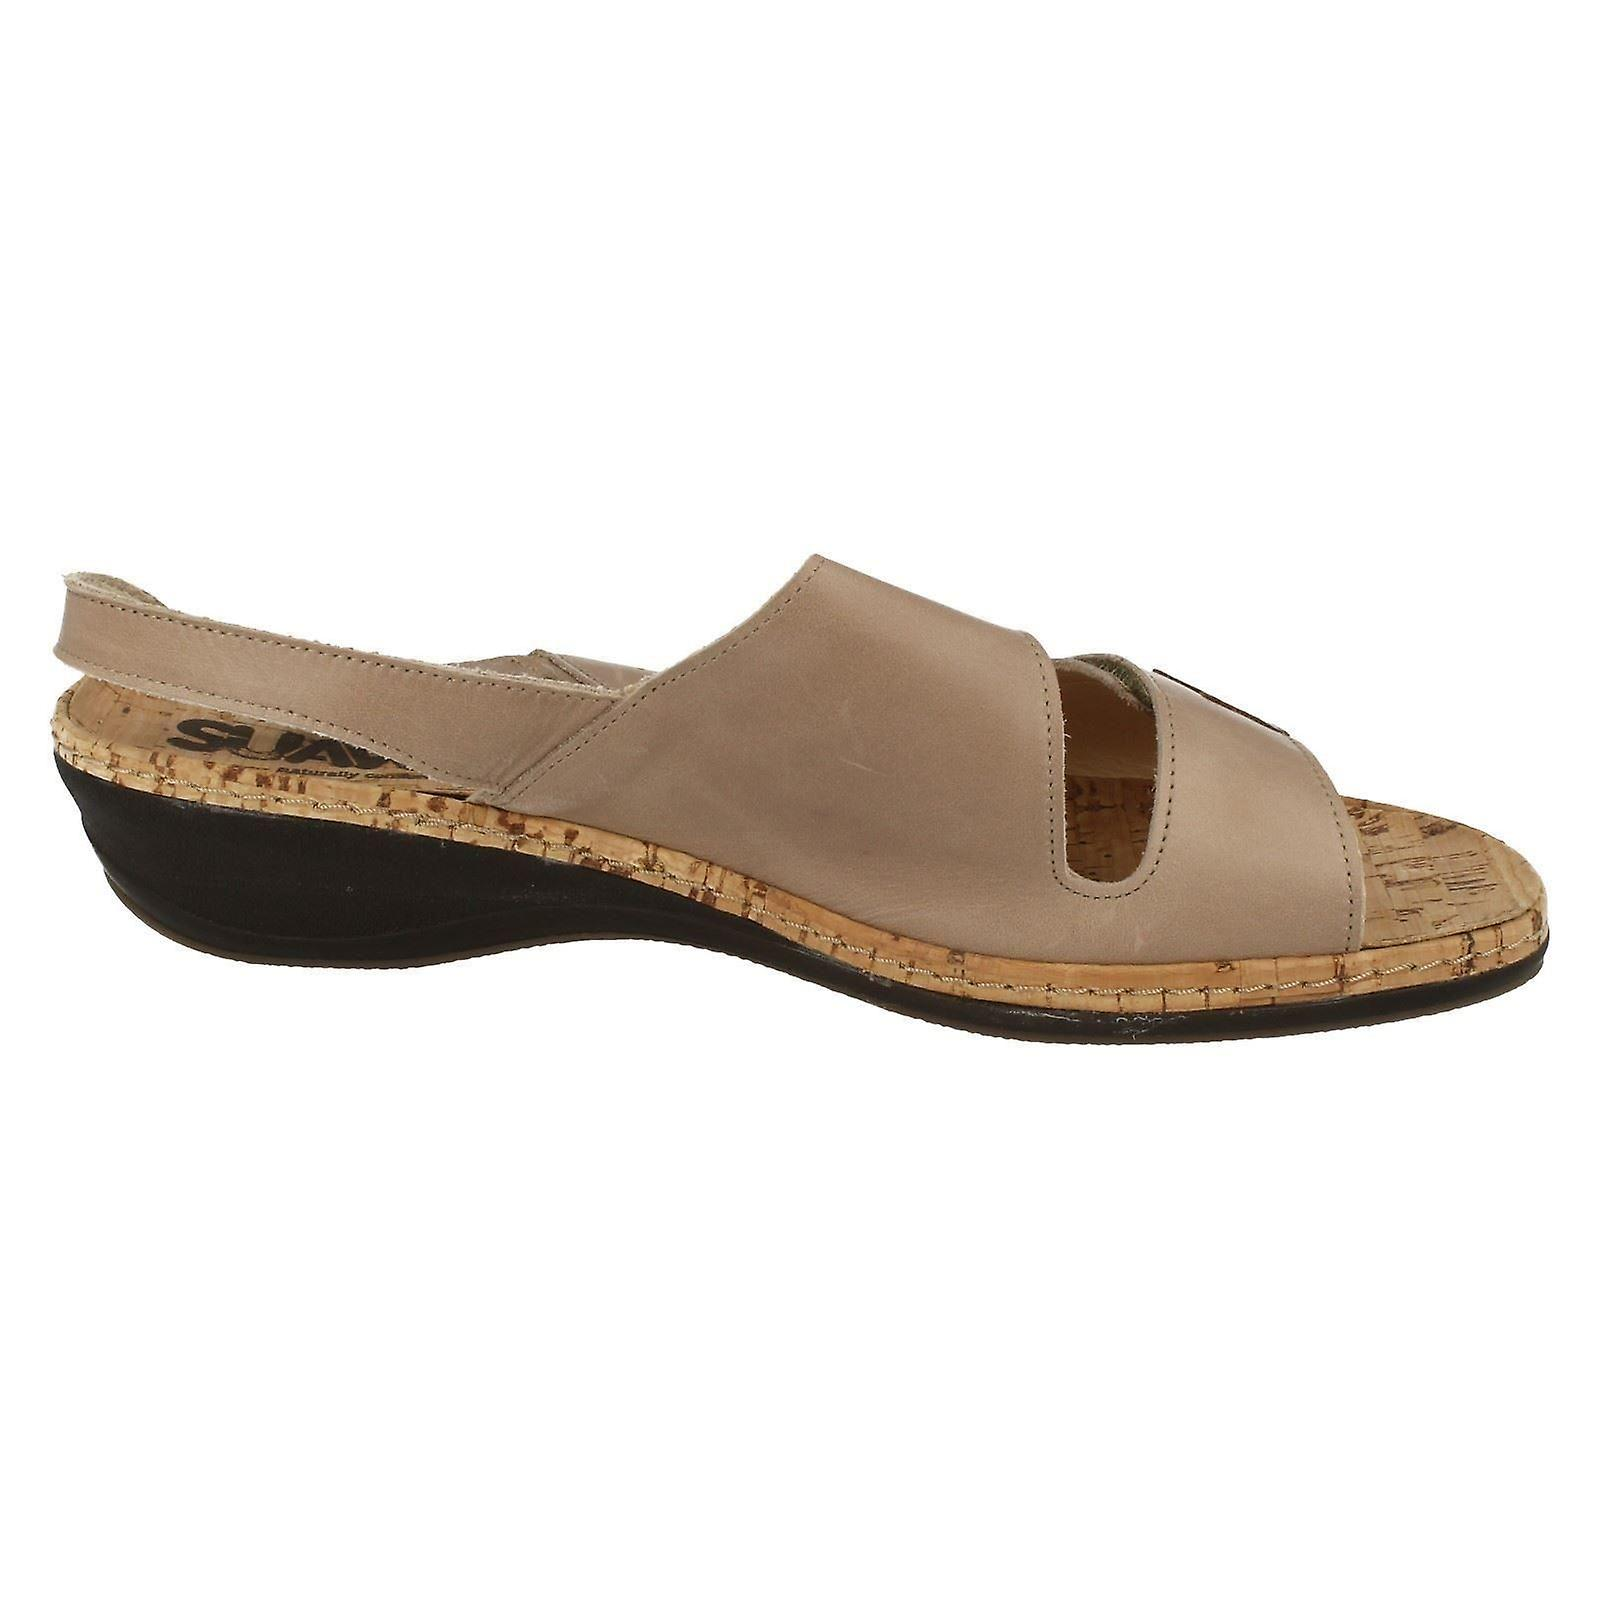 Ladies Suave Summer Sandals Hannah